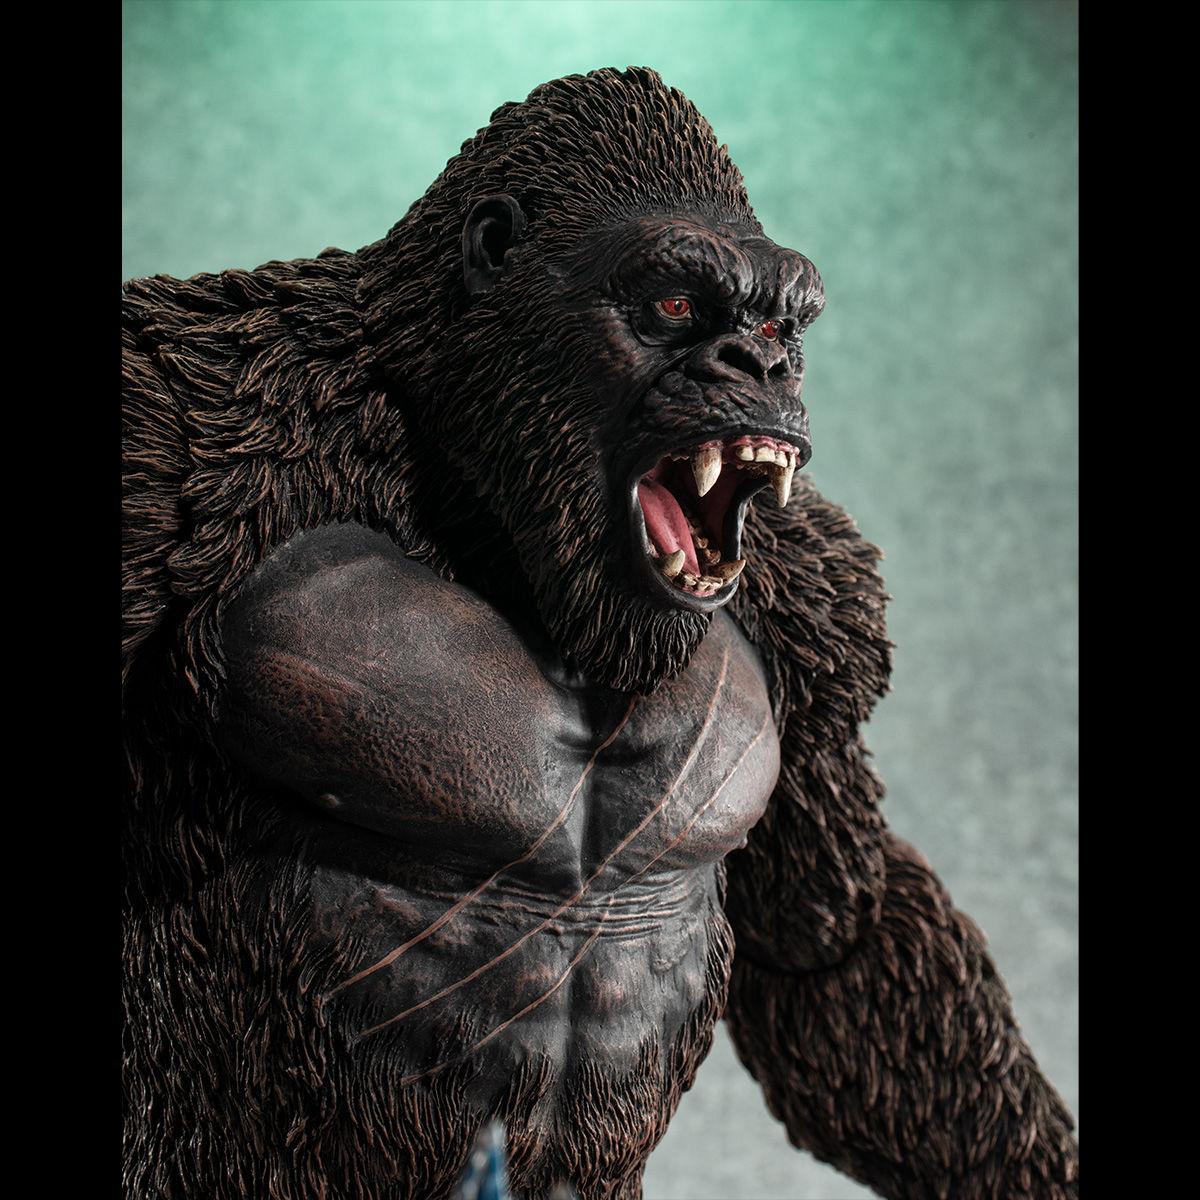 UA Monsters KONG from GODZILLAvs.KONG (2021)